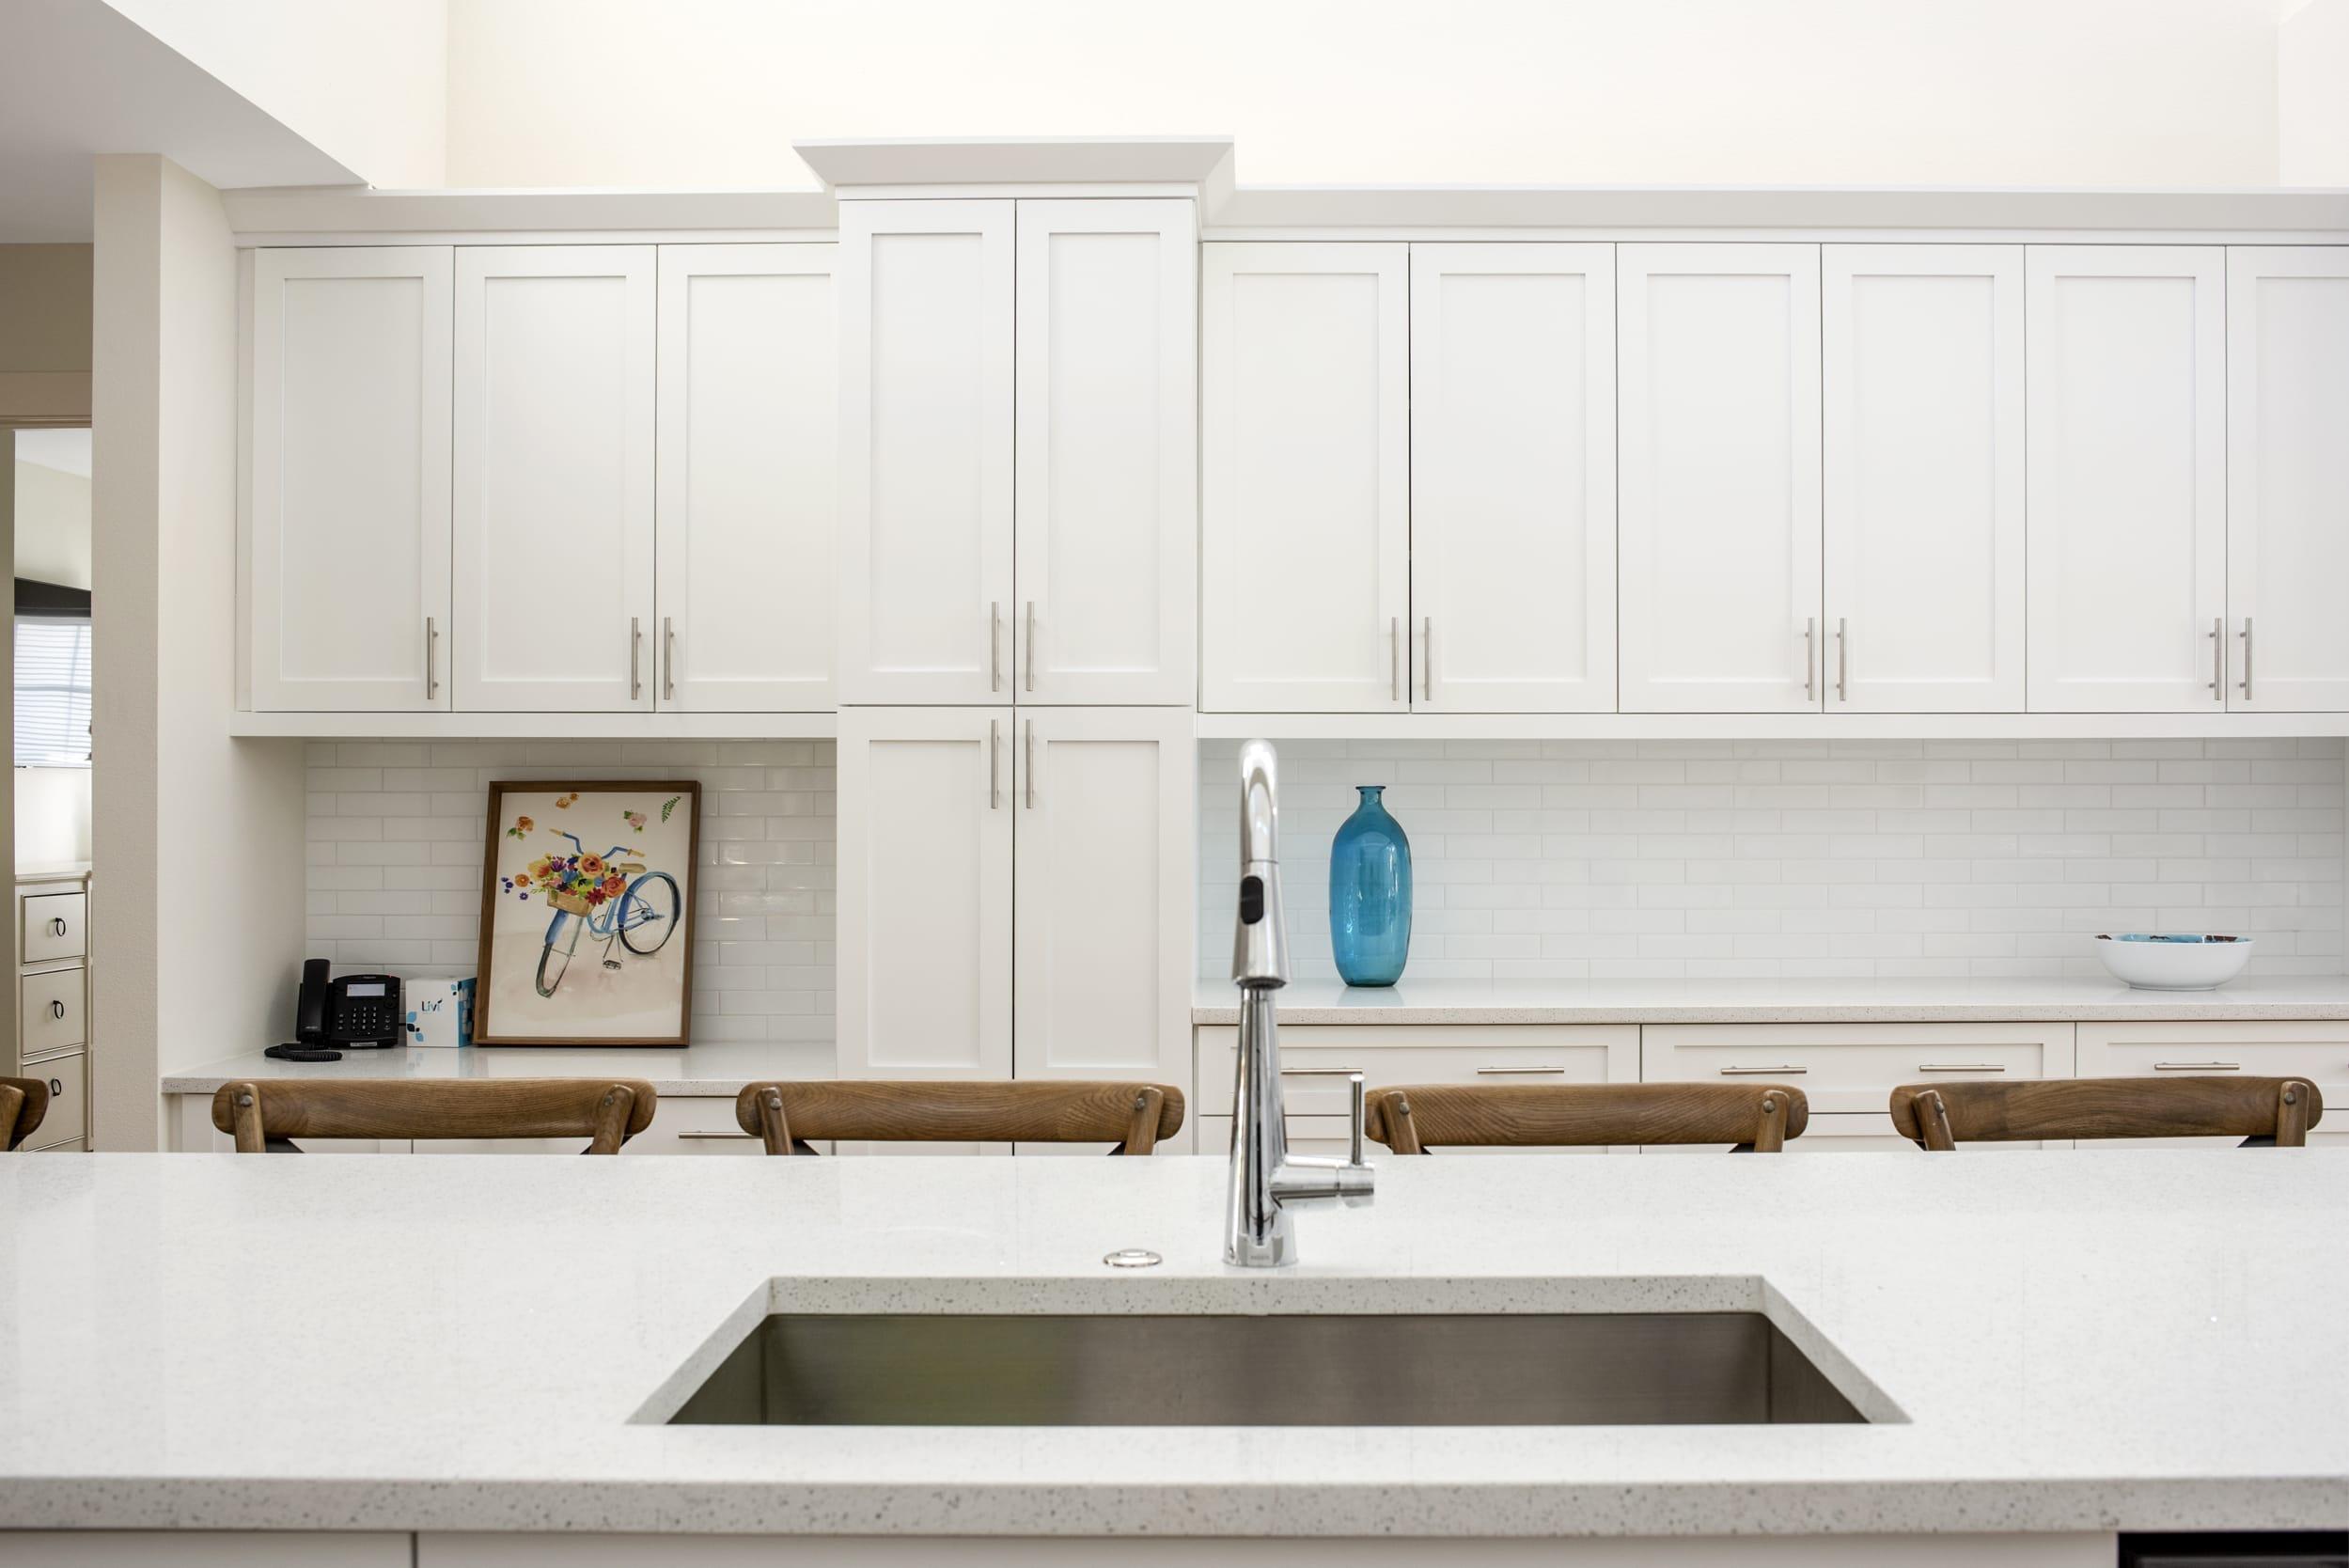 Sink White Island Cabinets Blue Glass Vase